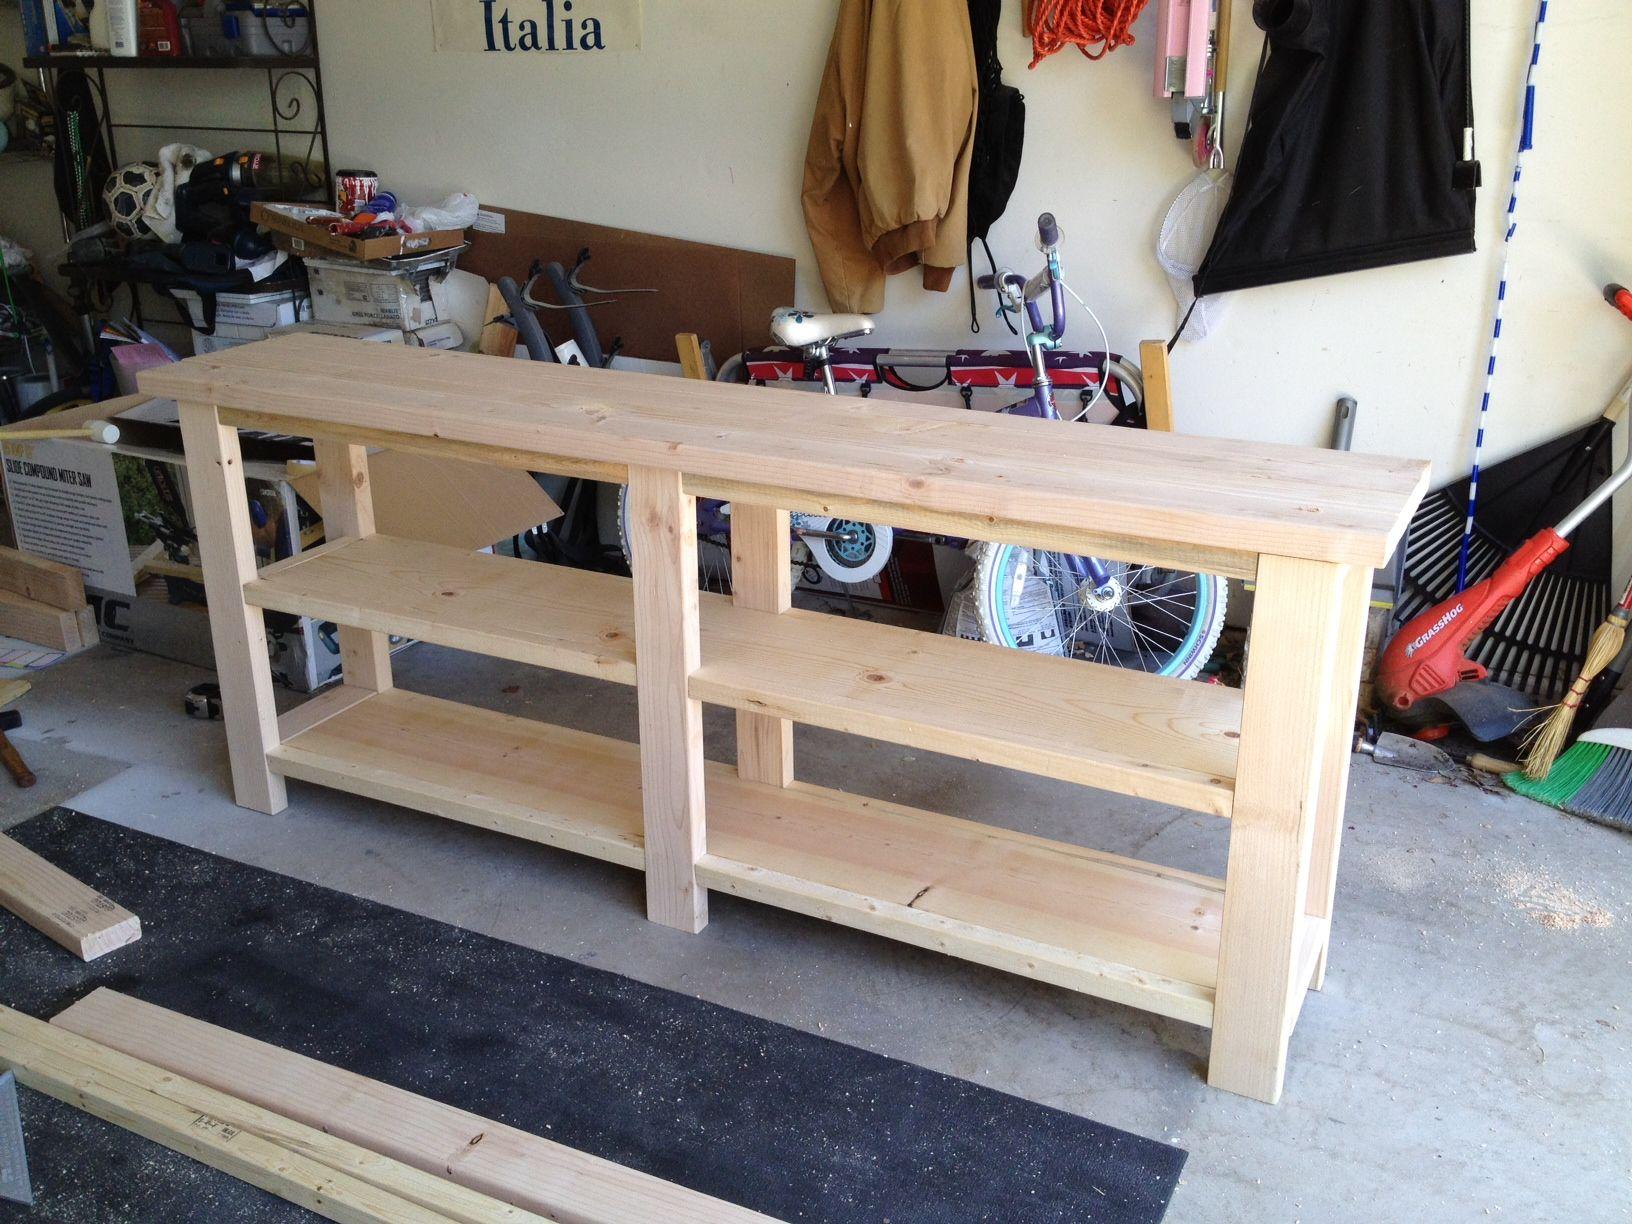 Build Sofa Table Plans Ana White DIY simple plywood dresser plans